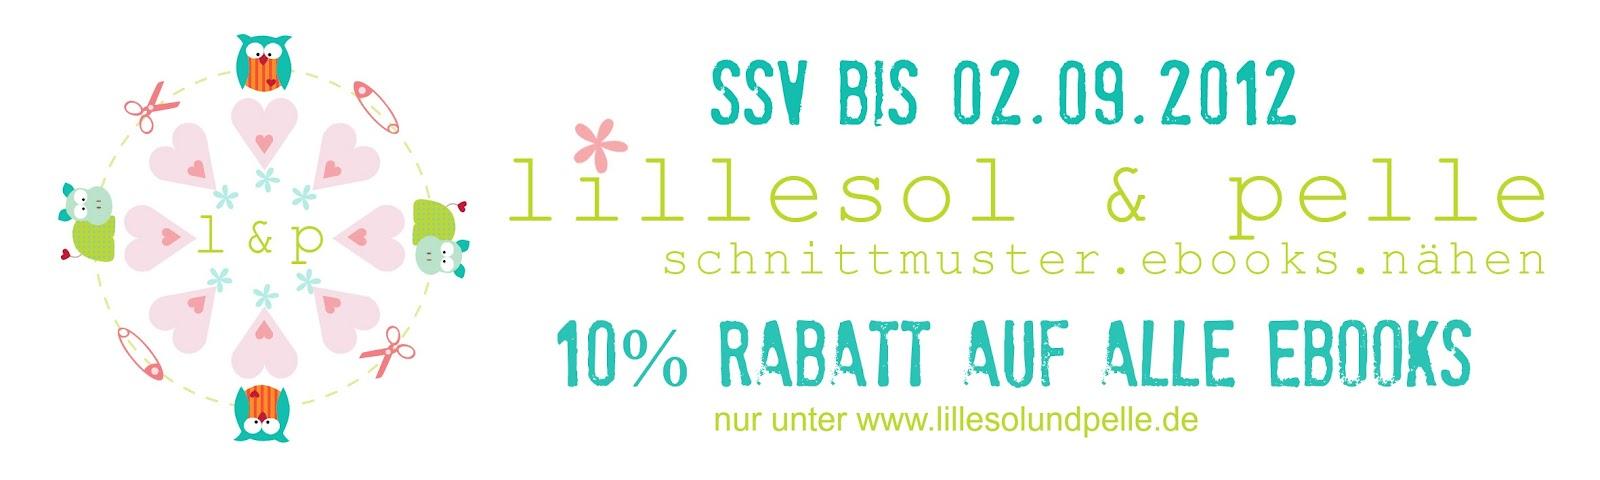 SSV: 10% Rabatt auf alle Ebooks | lillesol & pelle Schnittmuster ...